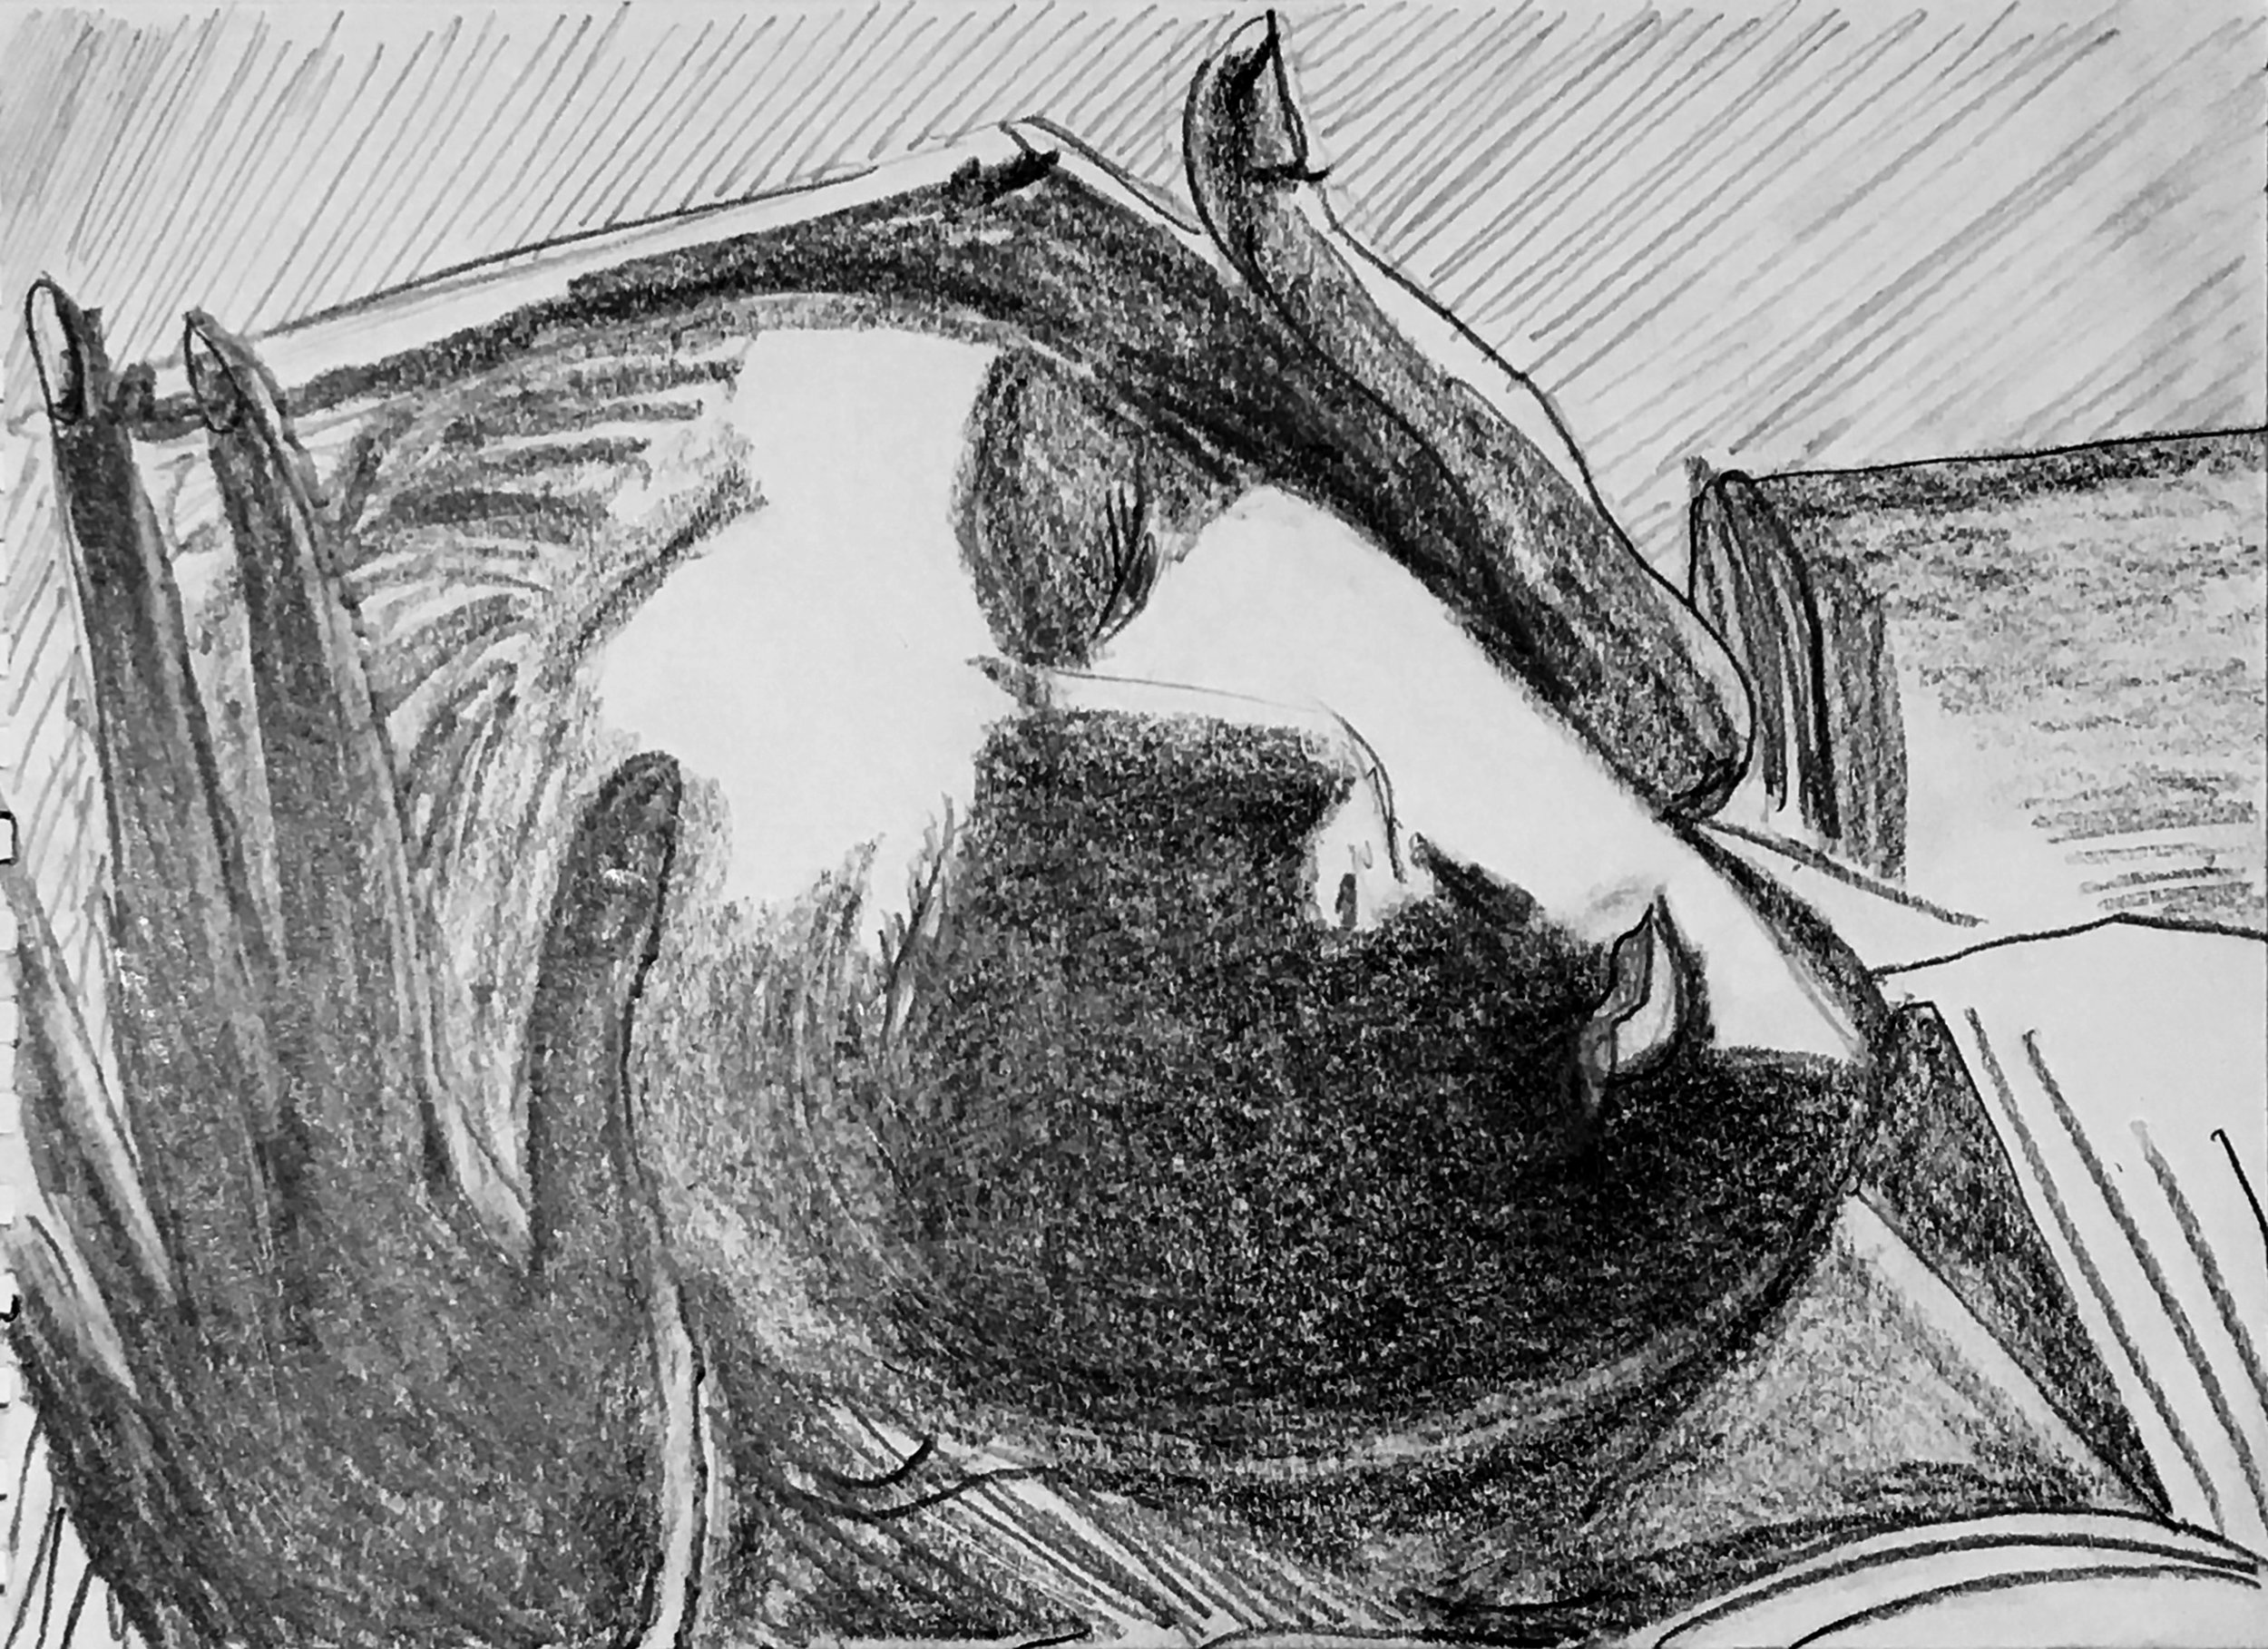 "Healing Hands, graphite on paper, 8"" x 6"", 2016"